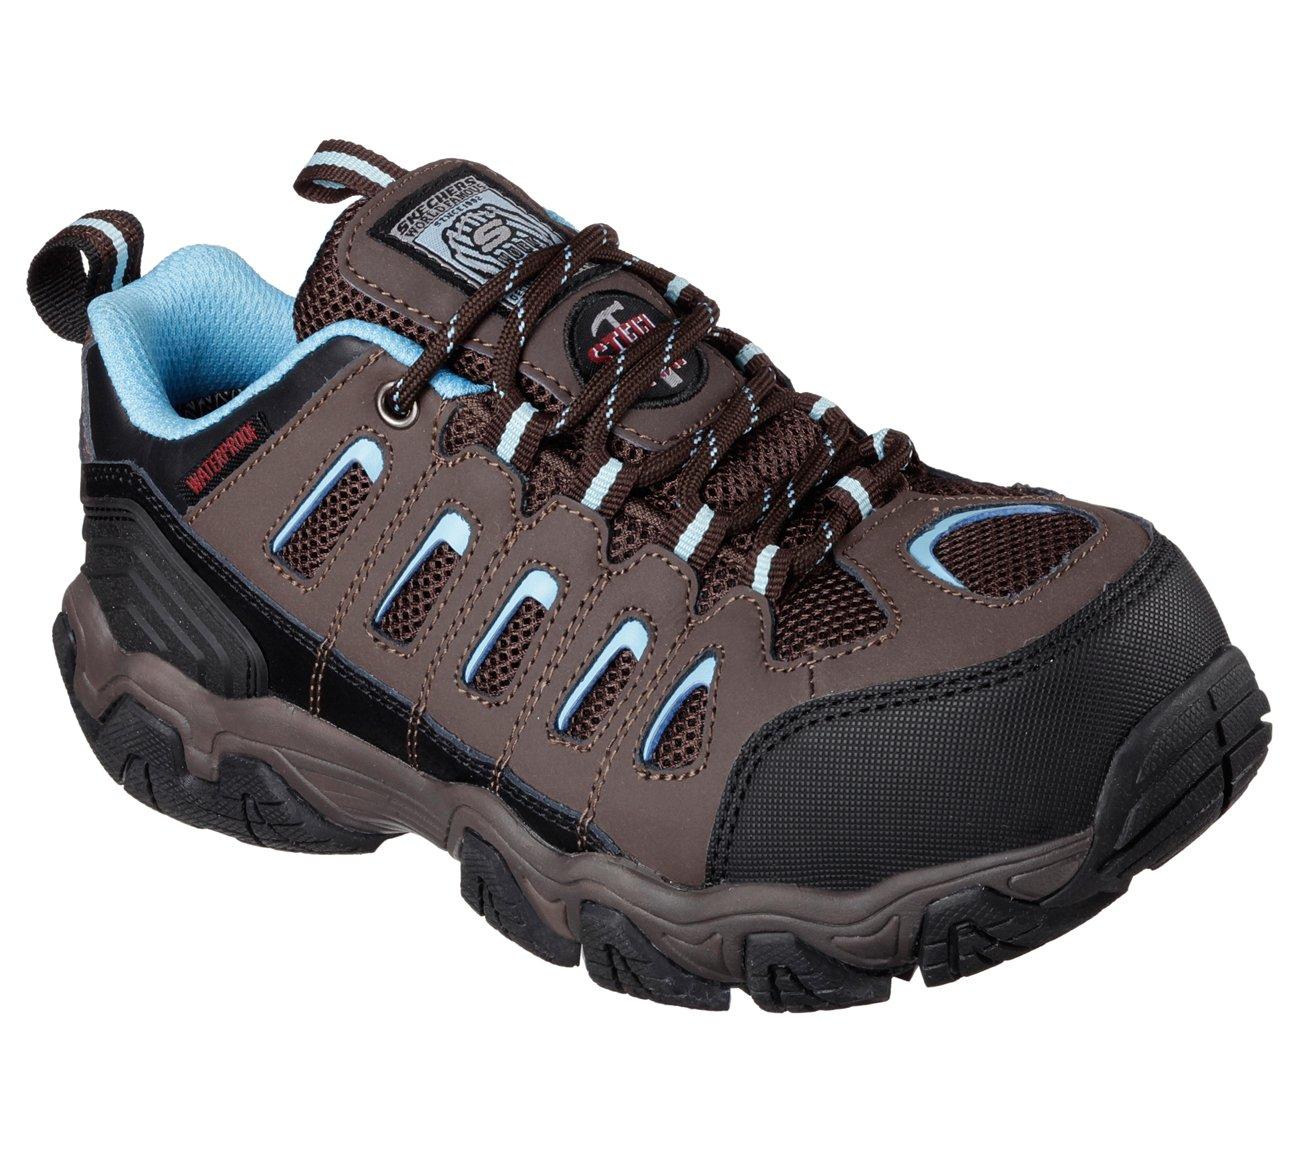 Skechers for Work Blais-Athol Hiking Shoe,Brown,8.5 M US